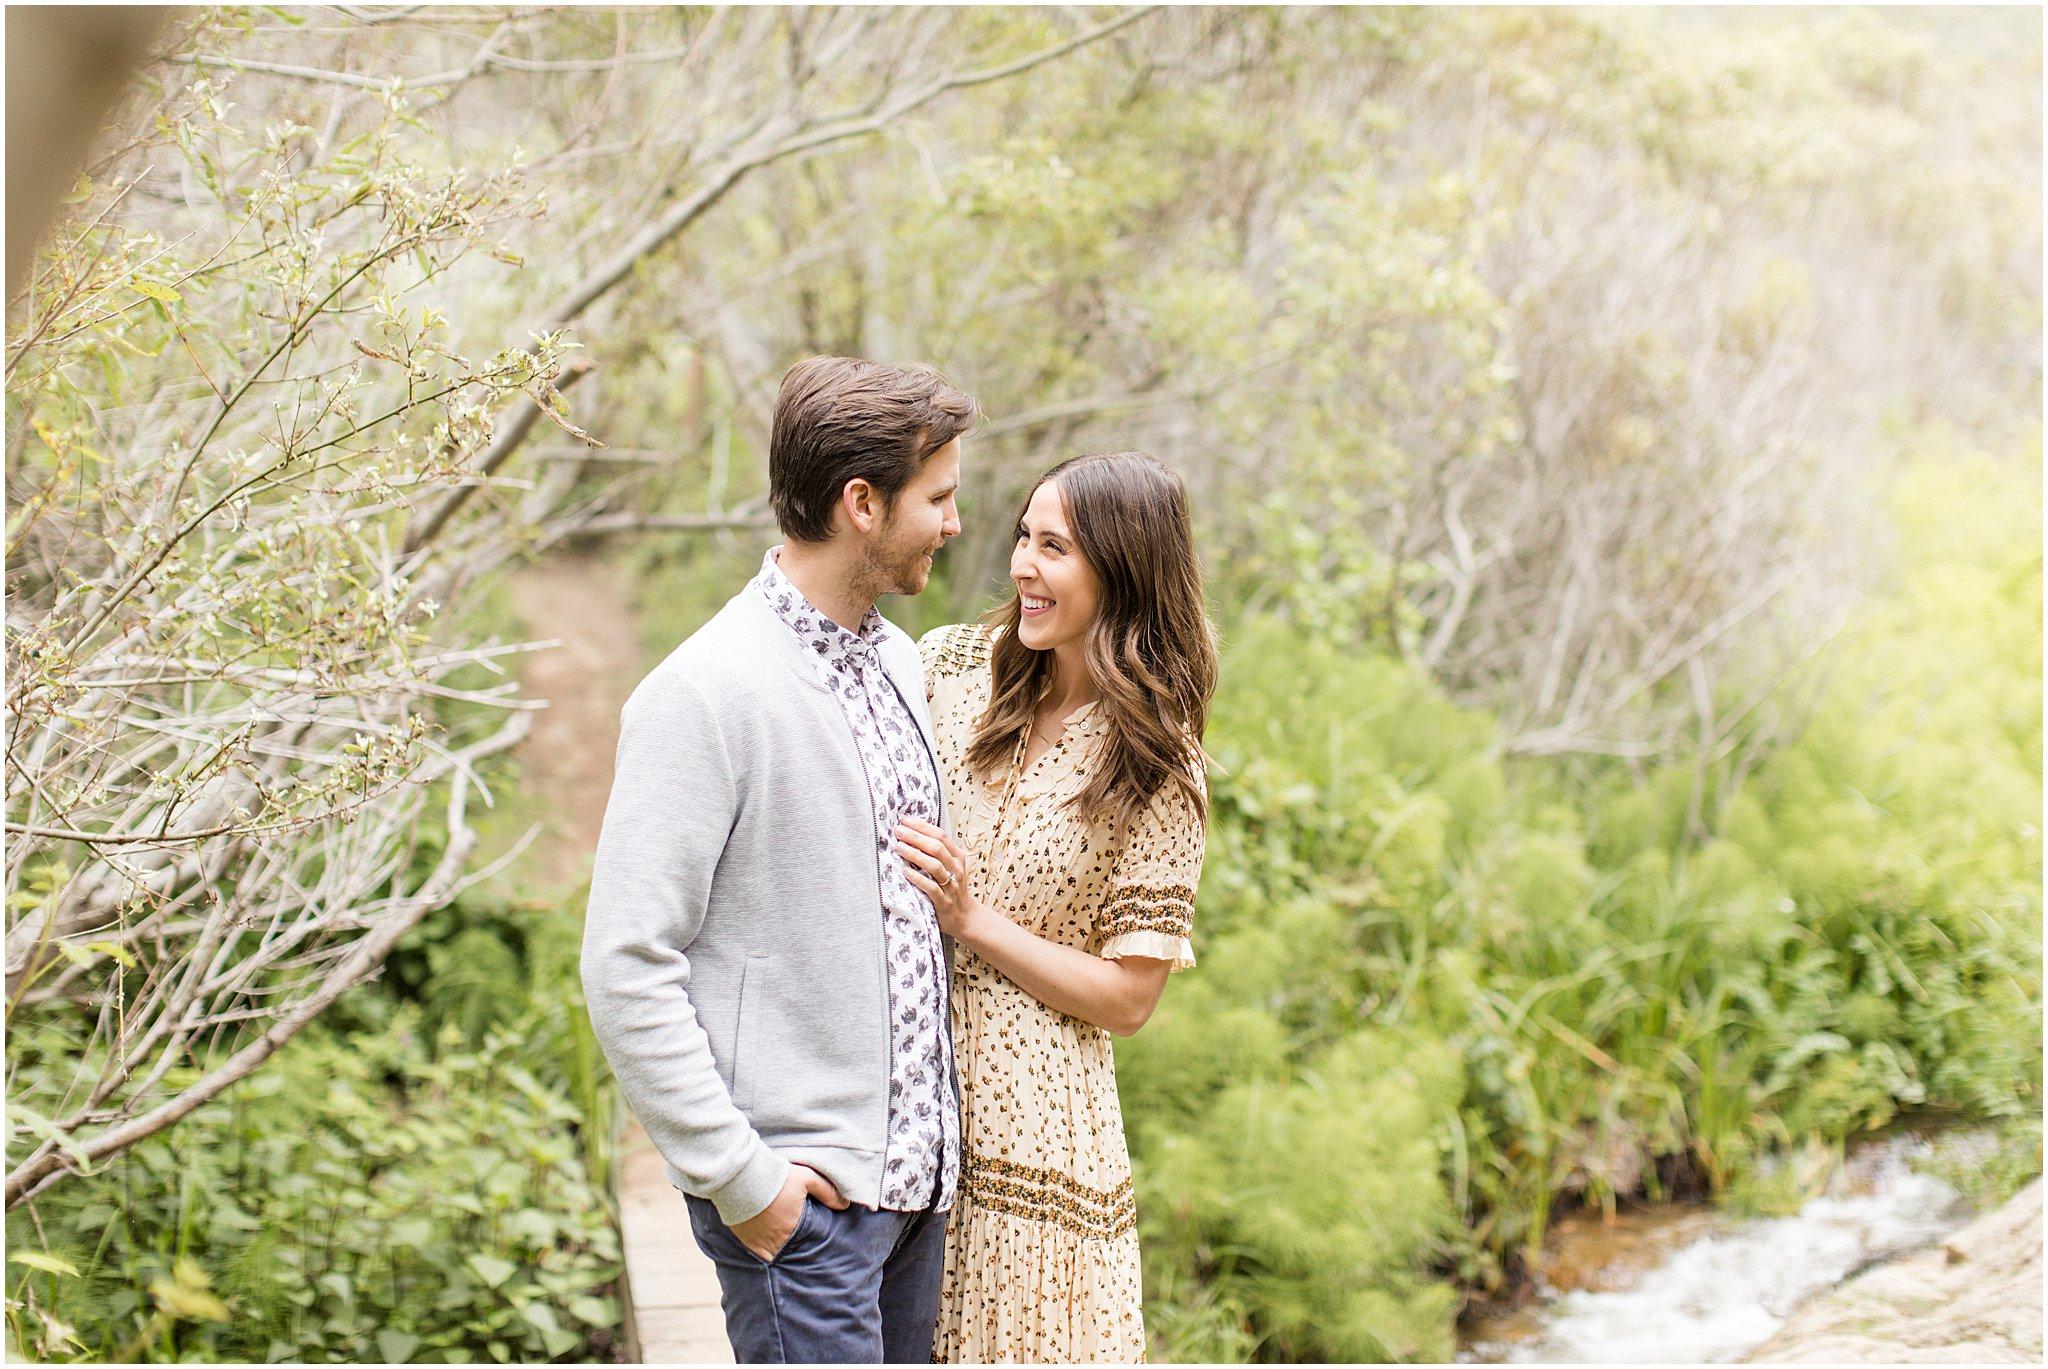 2019 carmel highlands garrapata state park couples portrait session bay area wedding photographer_0001.jpg